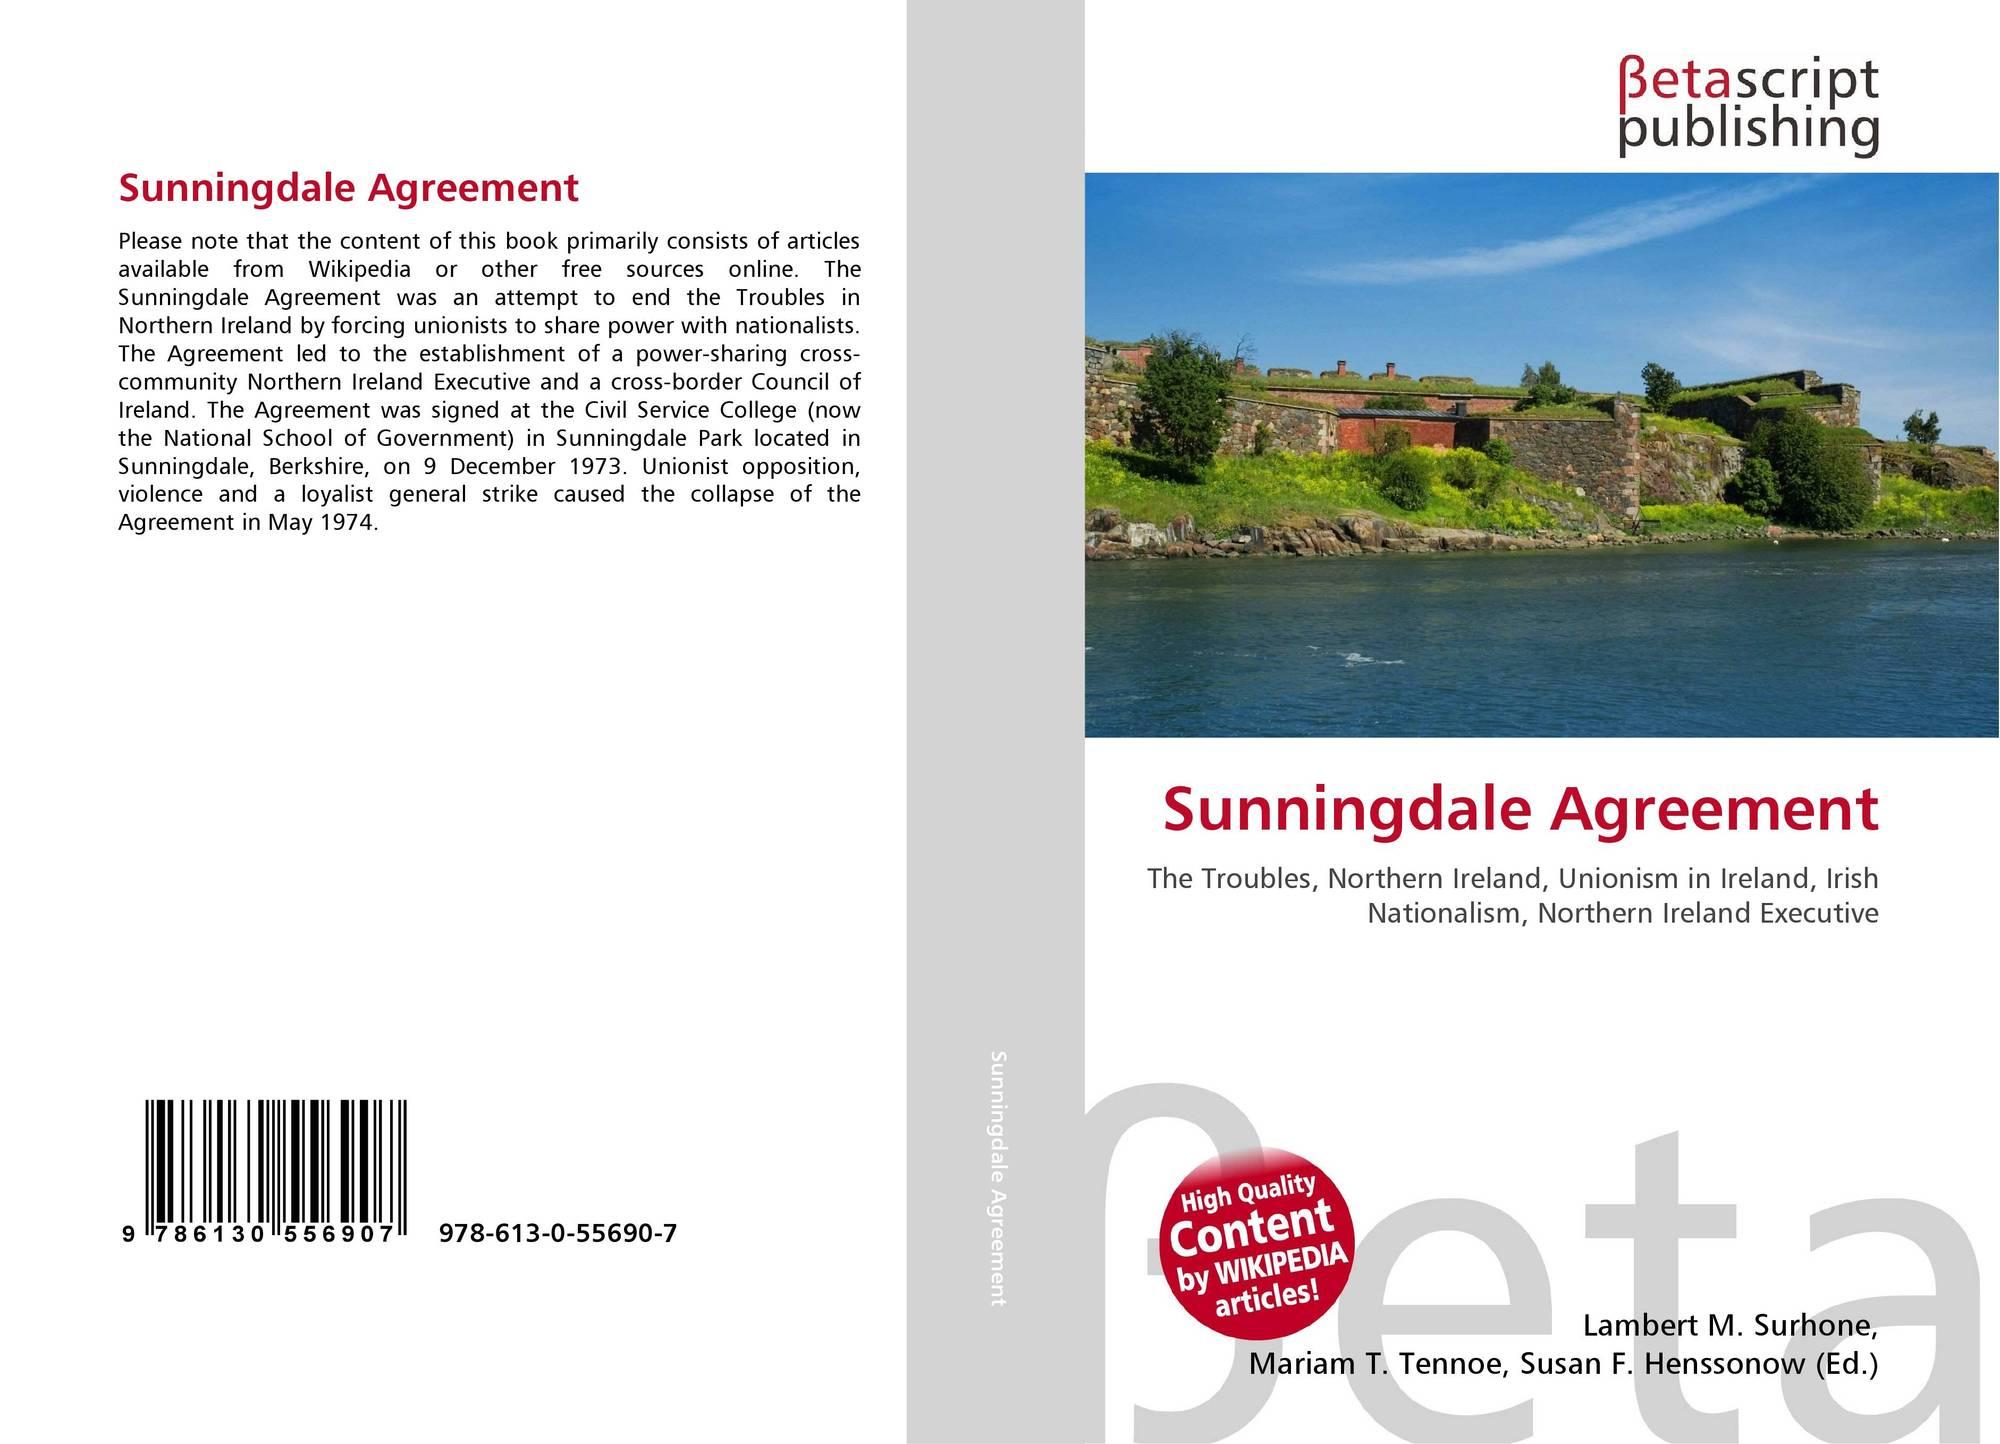 Sunningdale Agreement 978 613 0 55690 7 613055690x 9786130556907